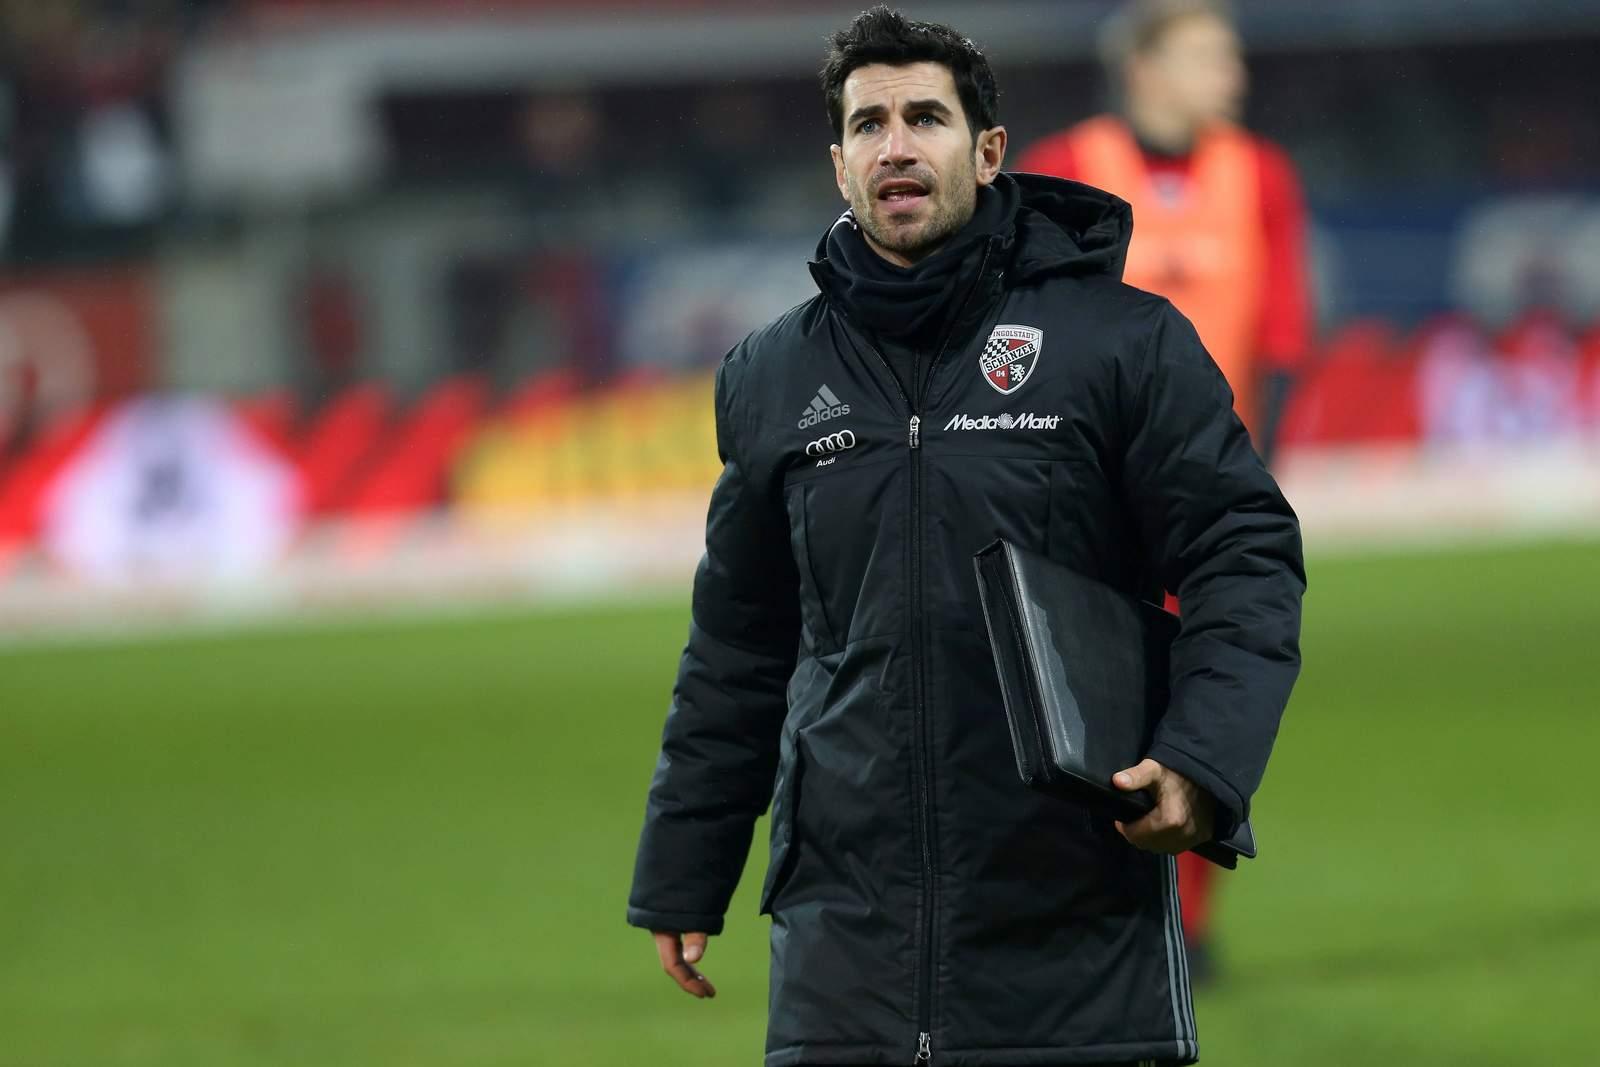 Ovid Hajou als Co-Trainer des FC Ingolstadt